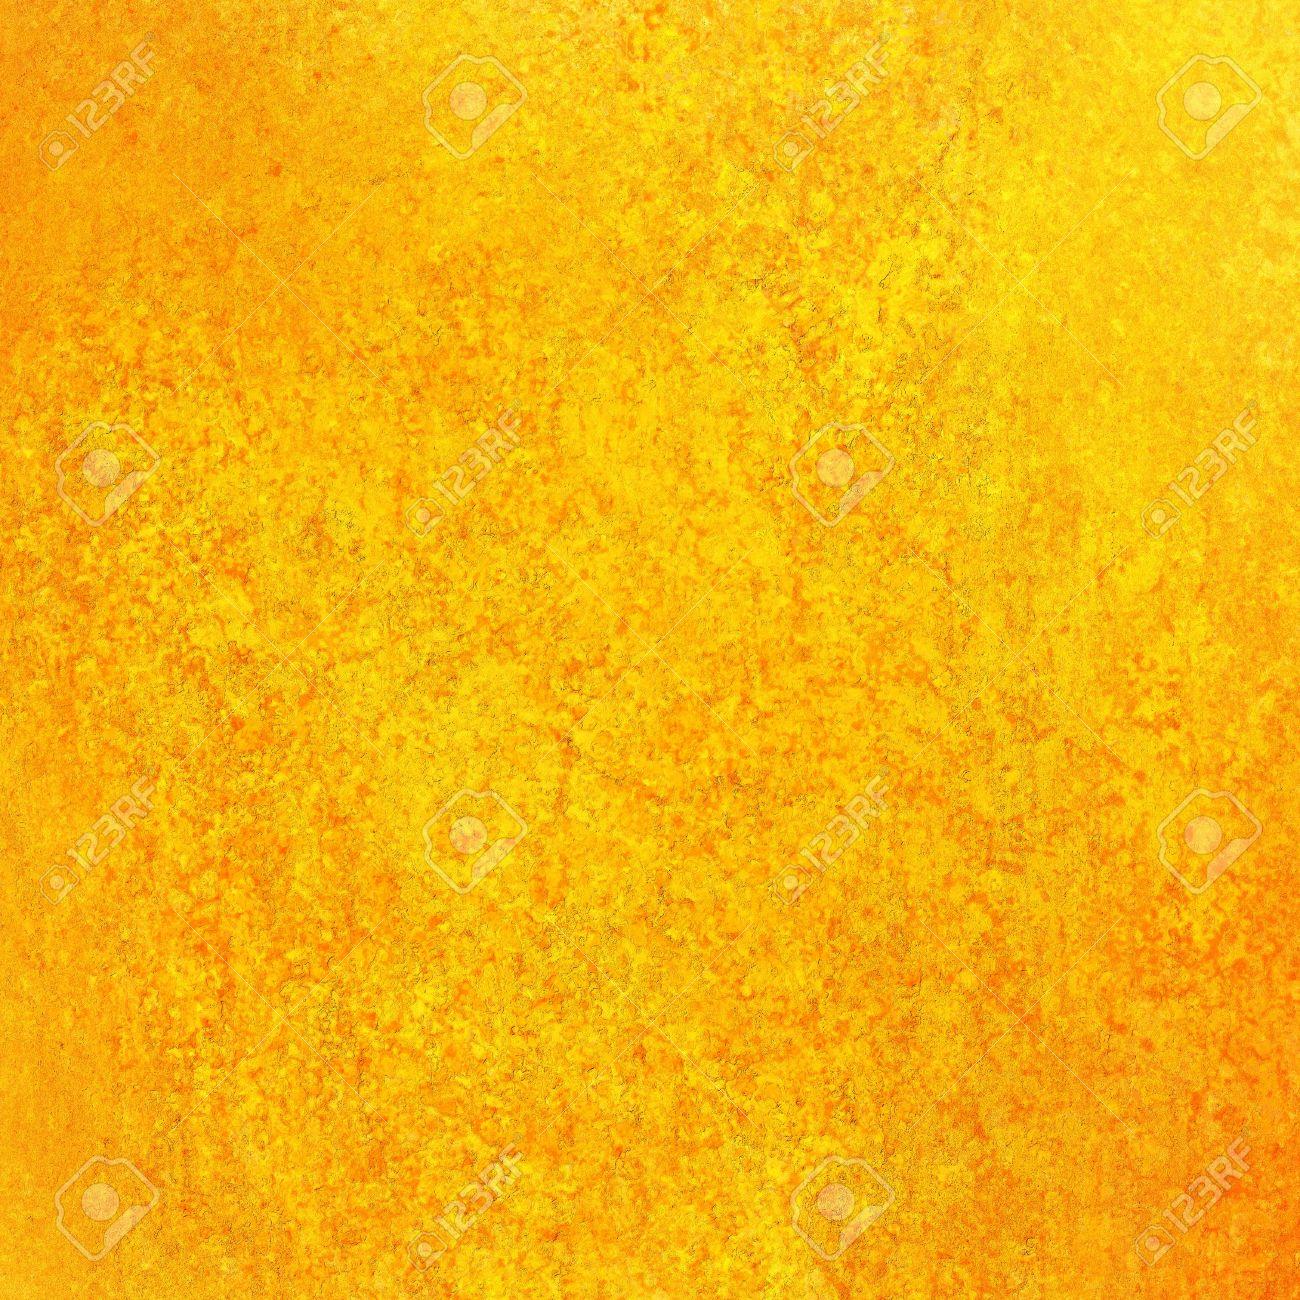 Abstract Gold Background Yellow Orange, Light Faint Vintage Grunge ...